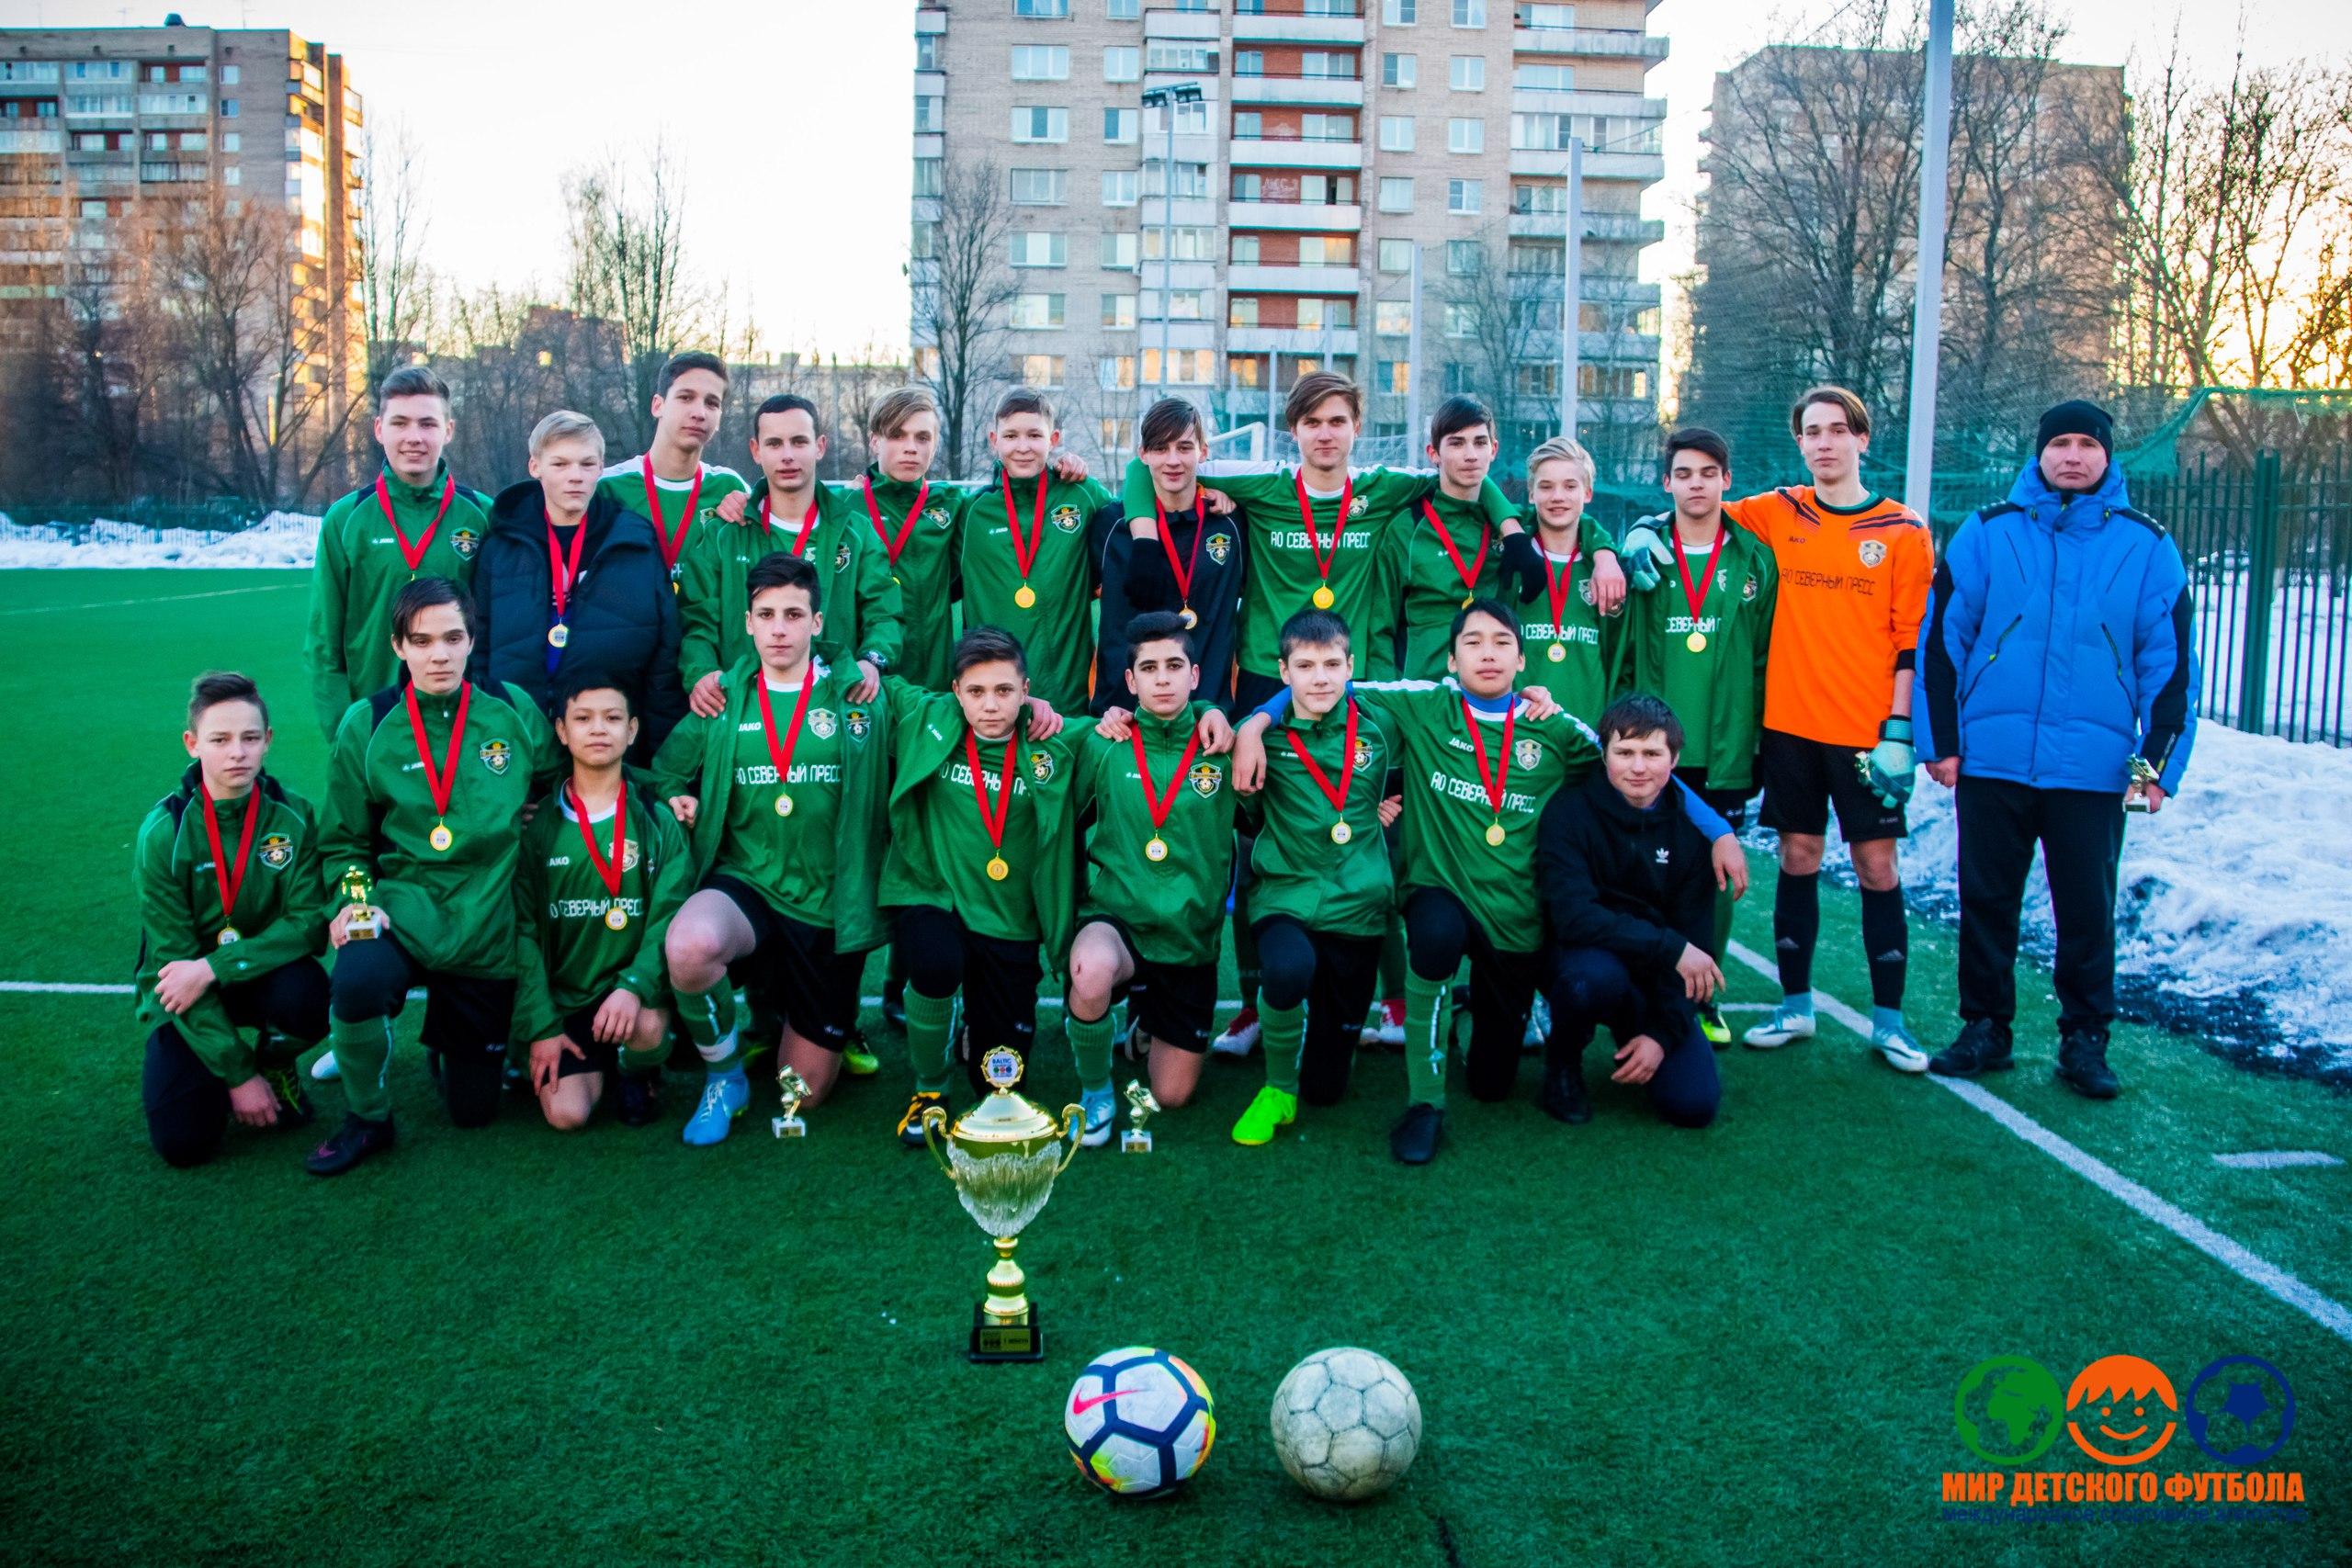 Baltic challenge cup 2017 (осень) 2002 г.р.